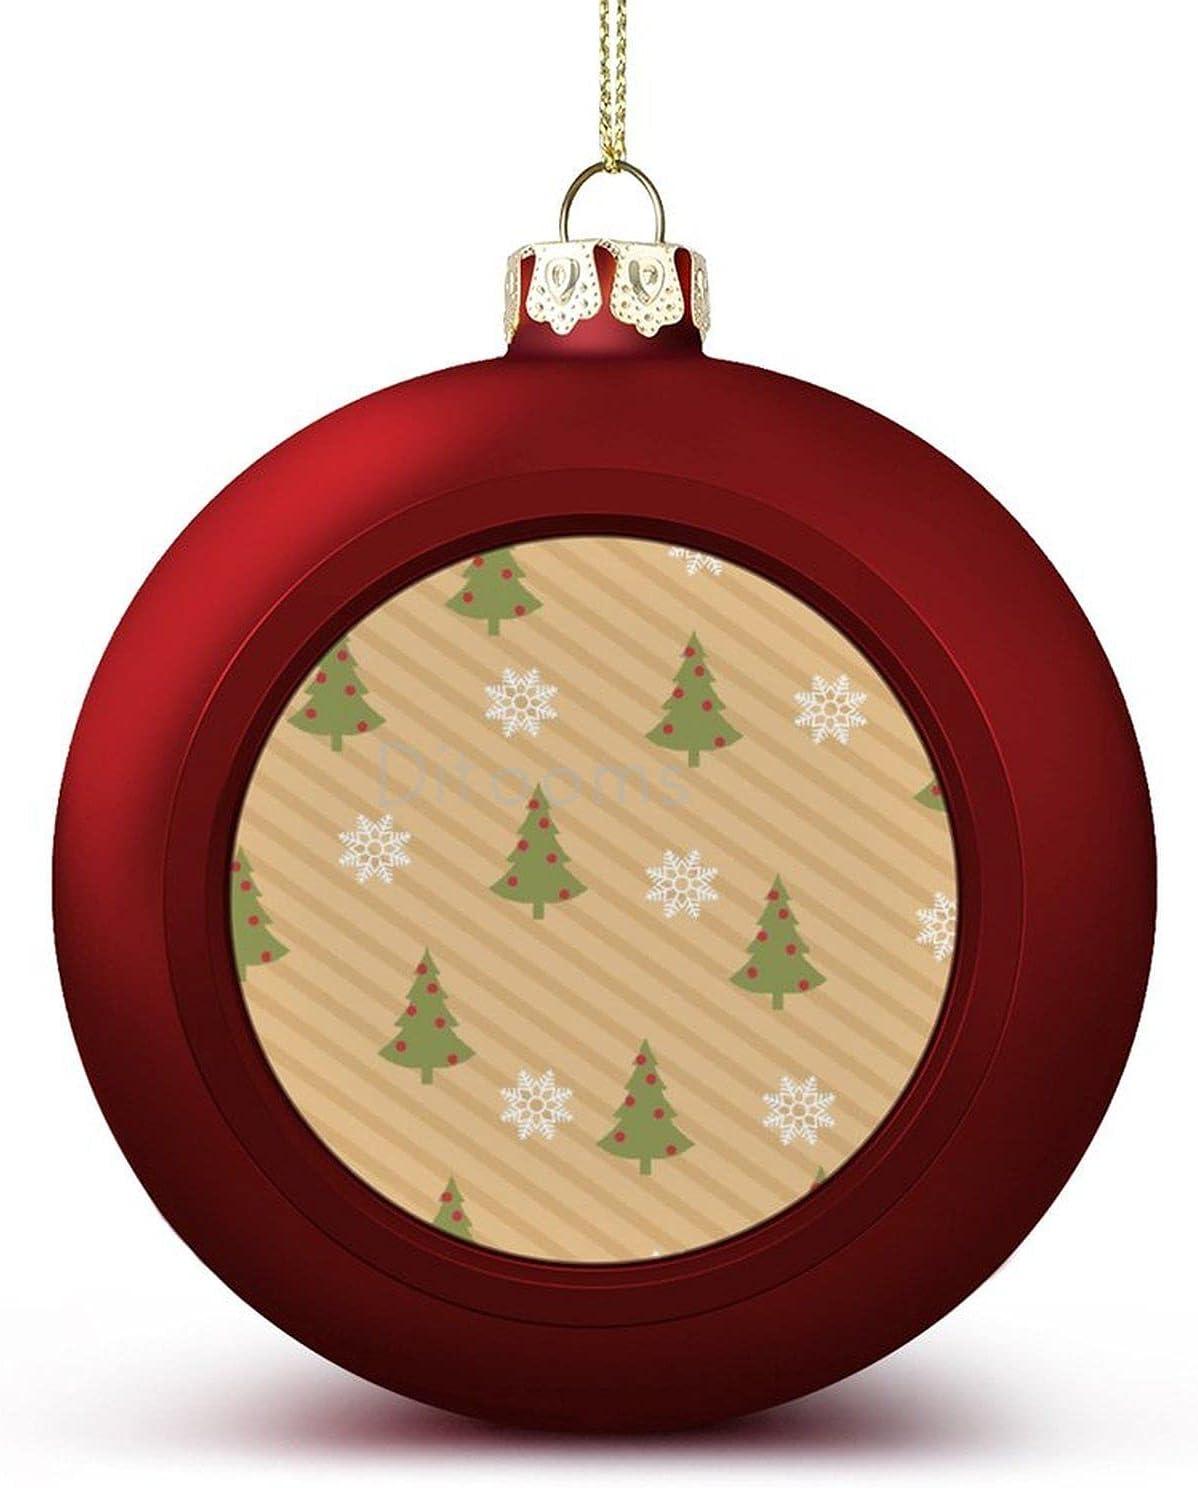 4PCS Japan Ranking TOP18 Maker New Christmas Balls Ornaments Decorat Merry